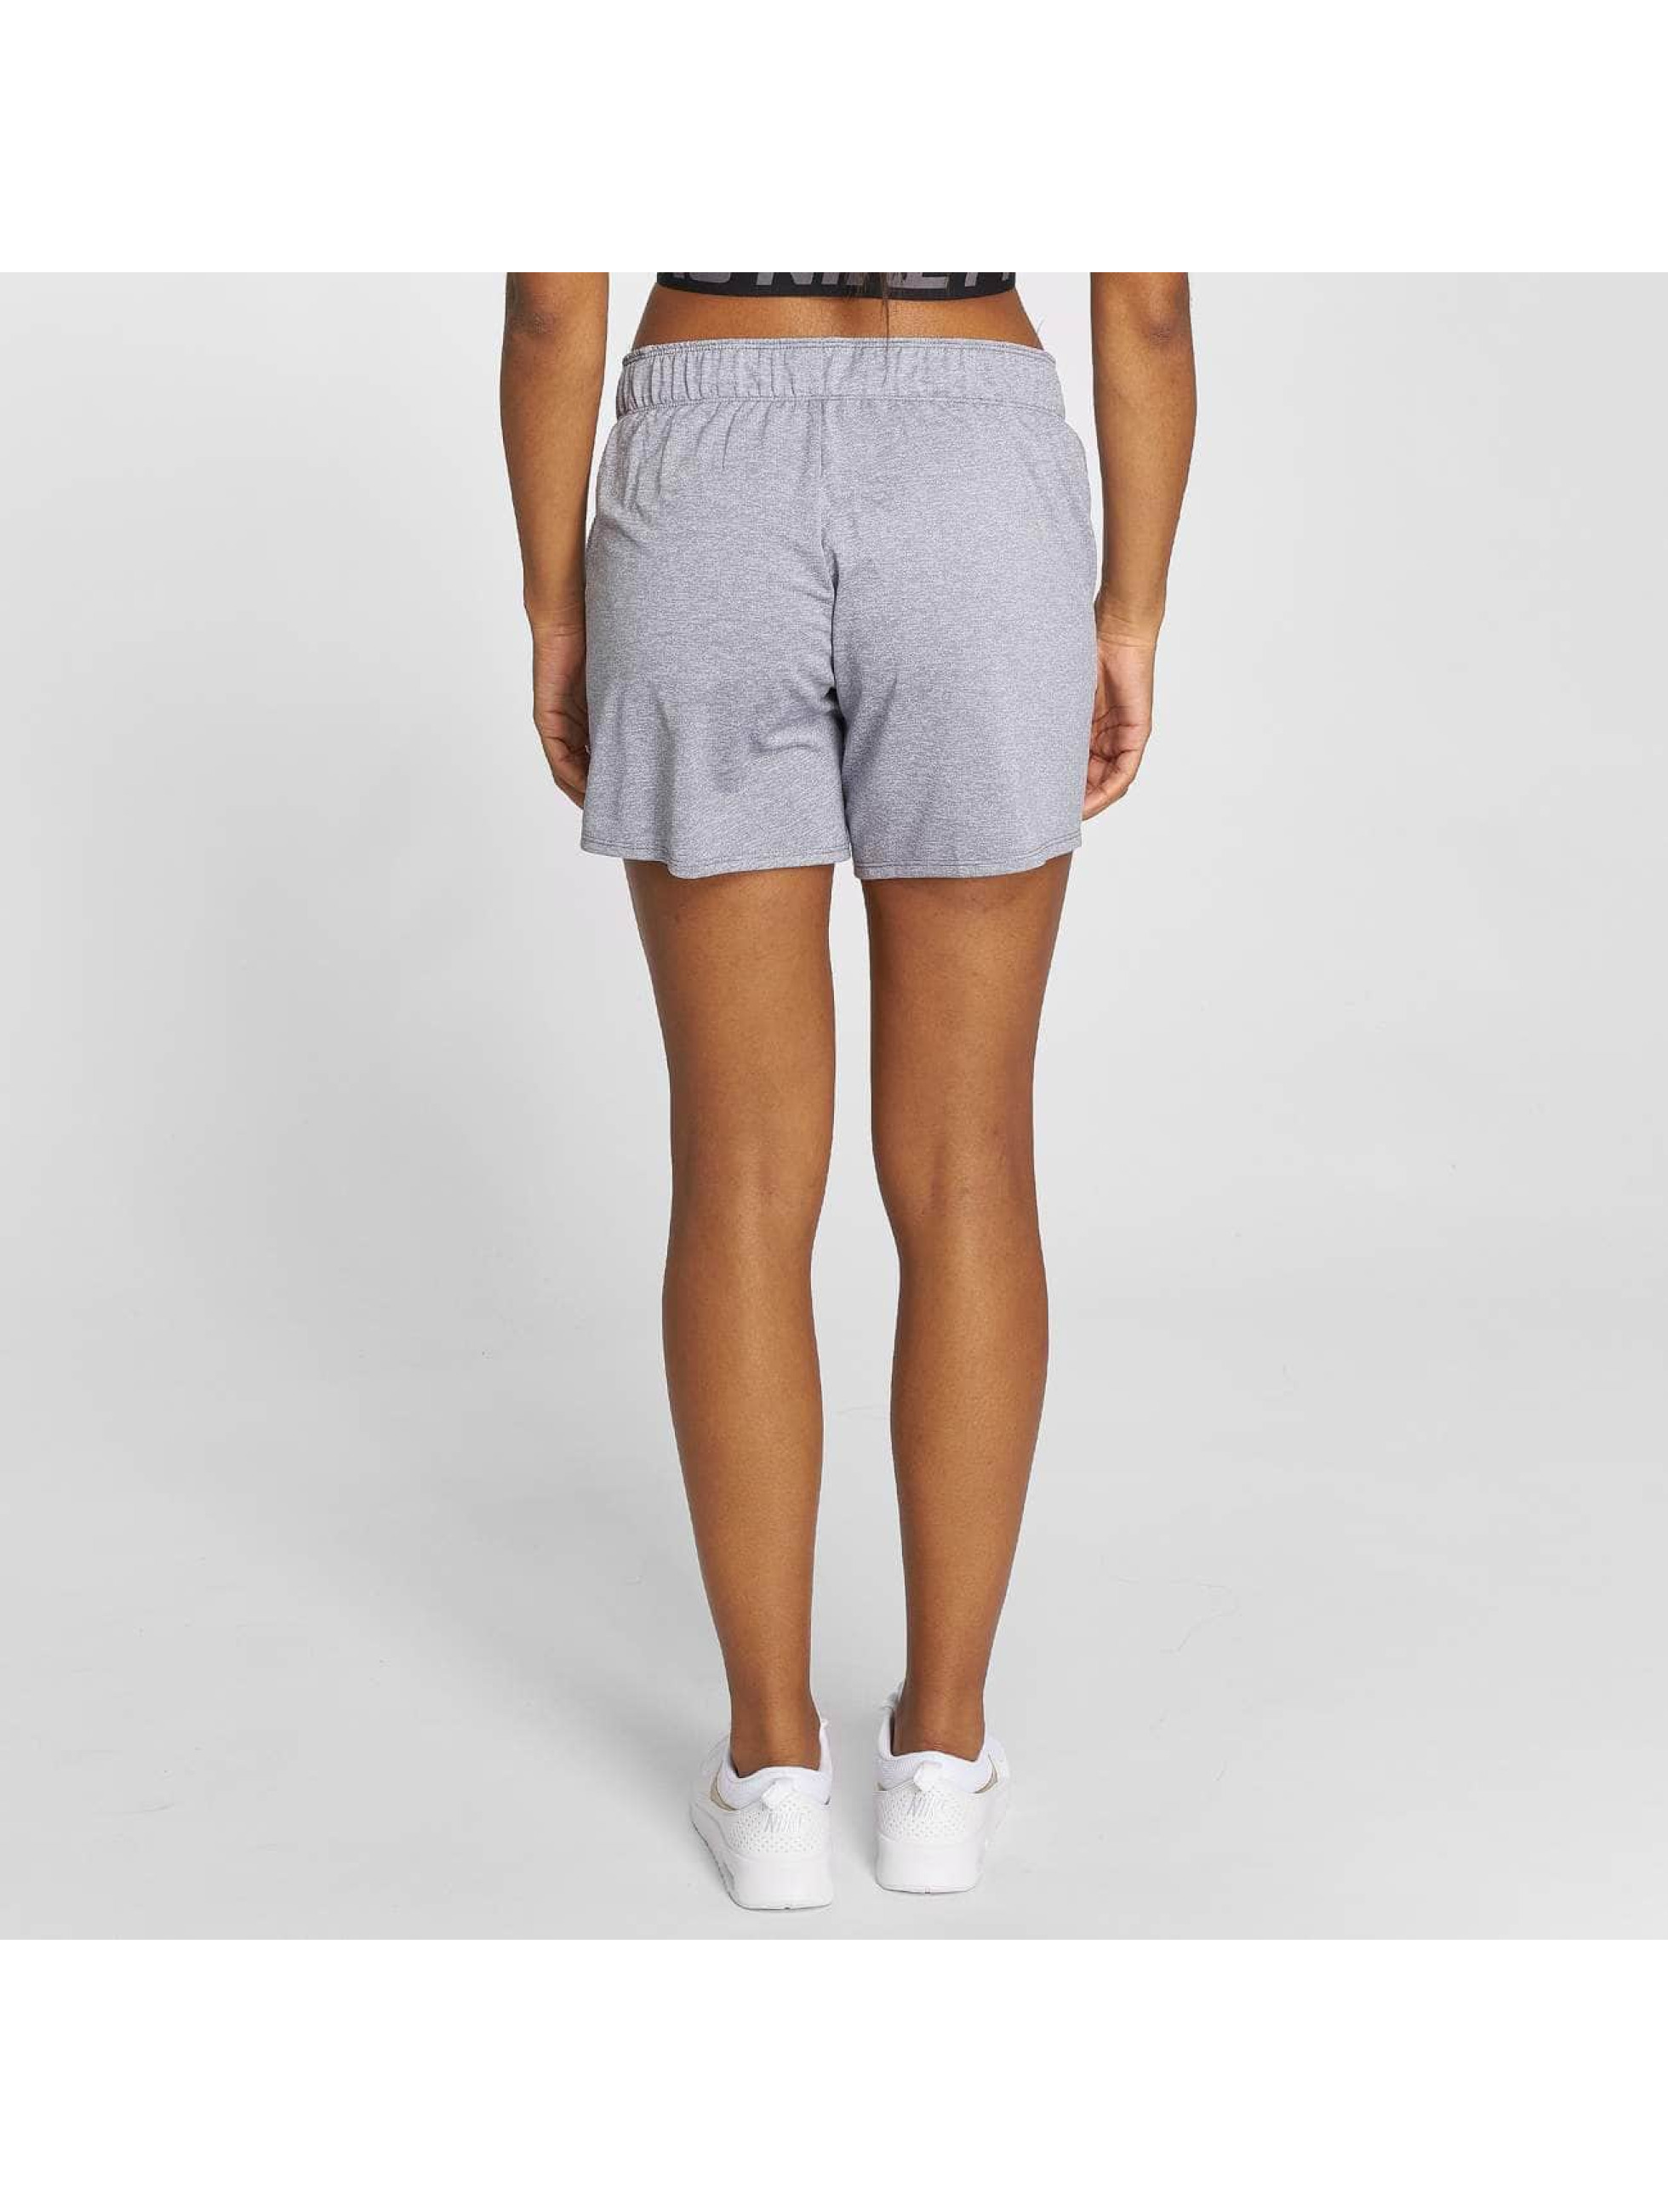 Nike Performance shorts Training grijs